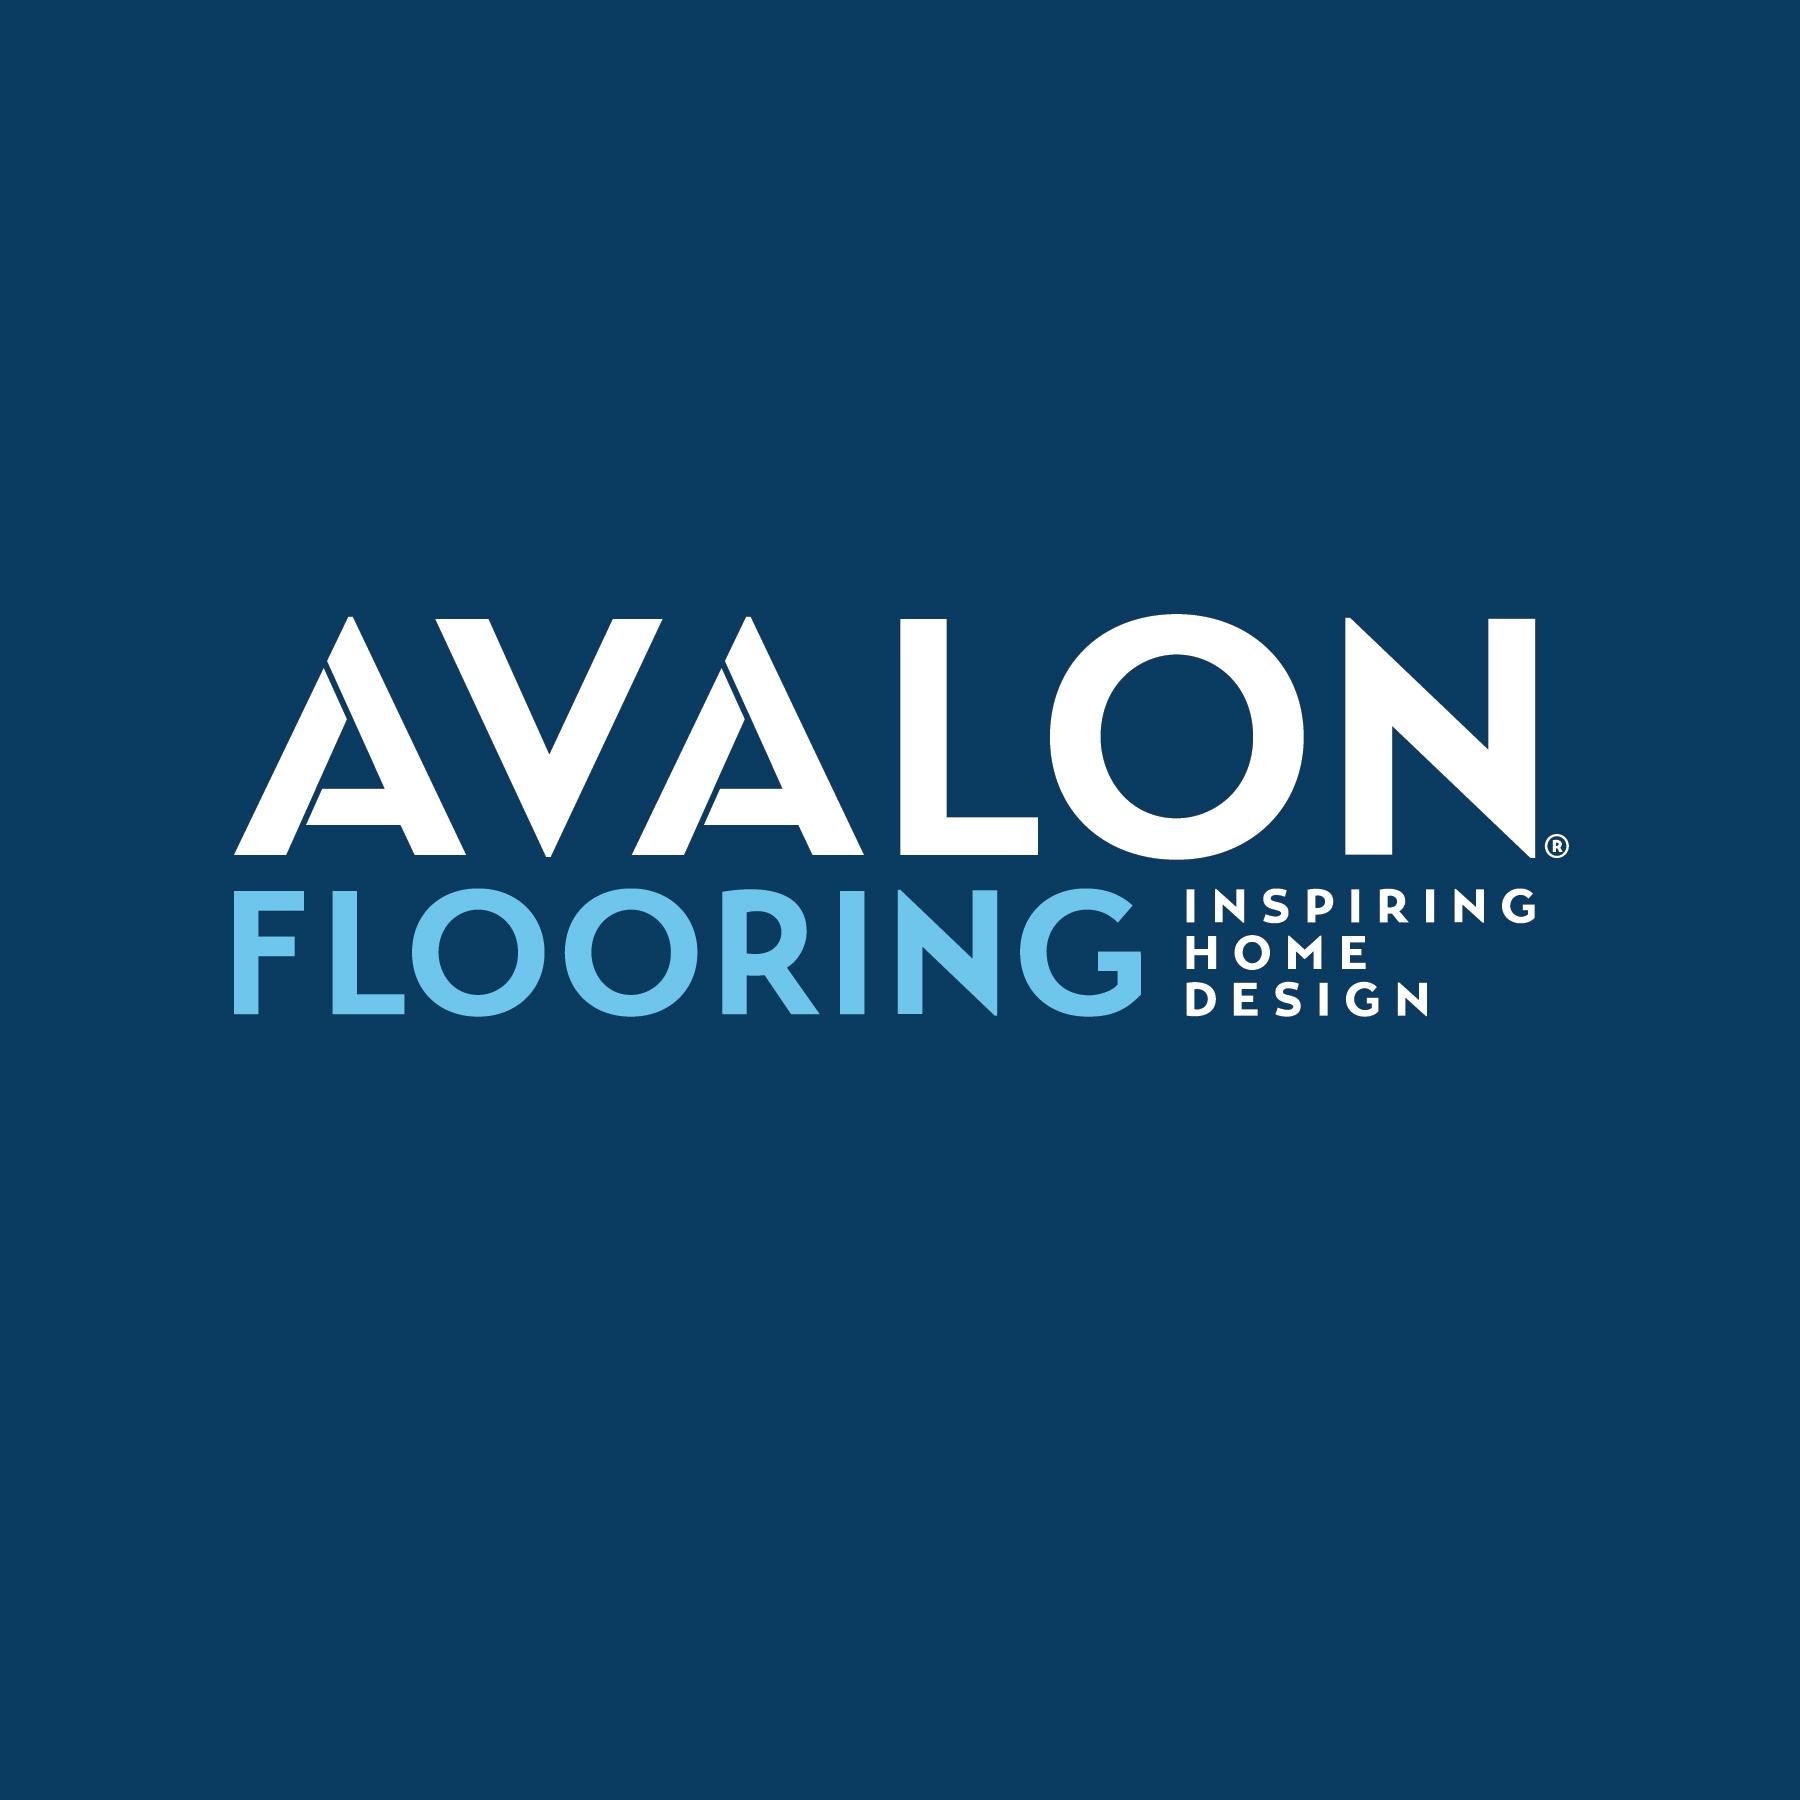 Avalon Flooring Celebrates 20 Years in Manahawkin NJ  Thanking Local Residents With Customer